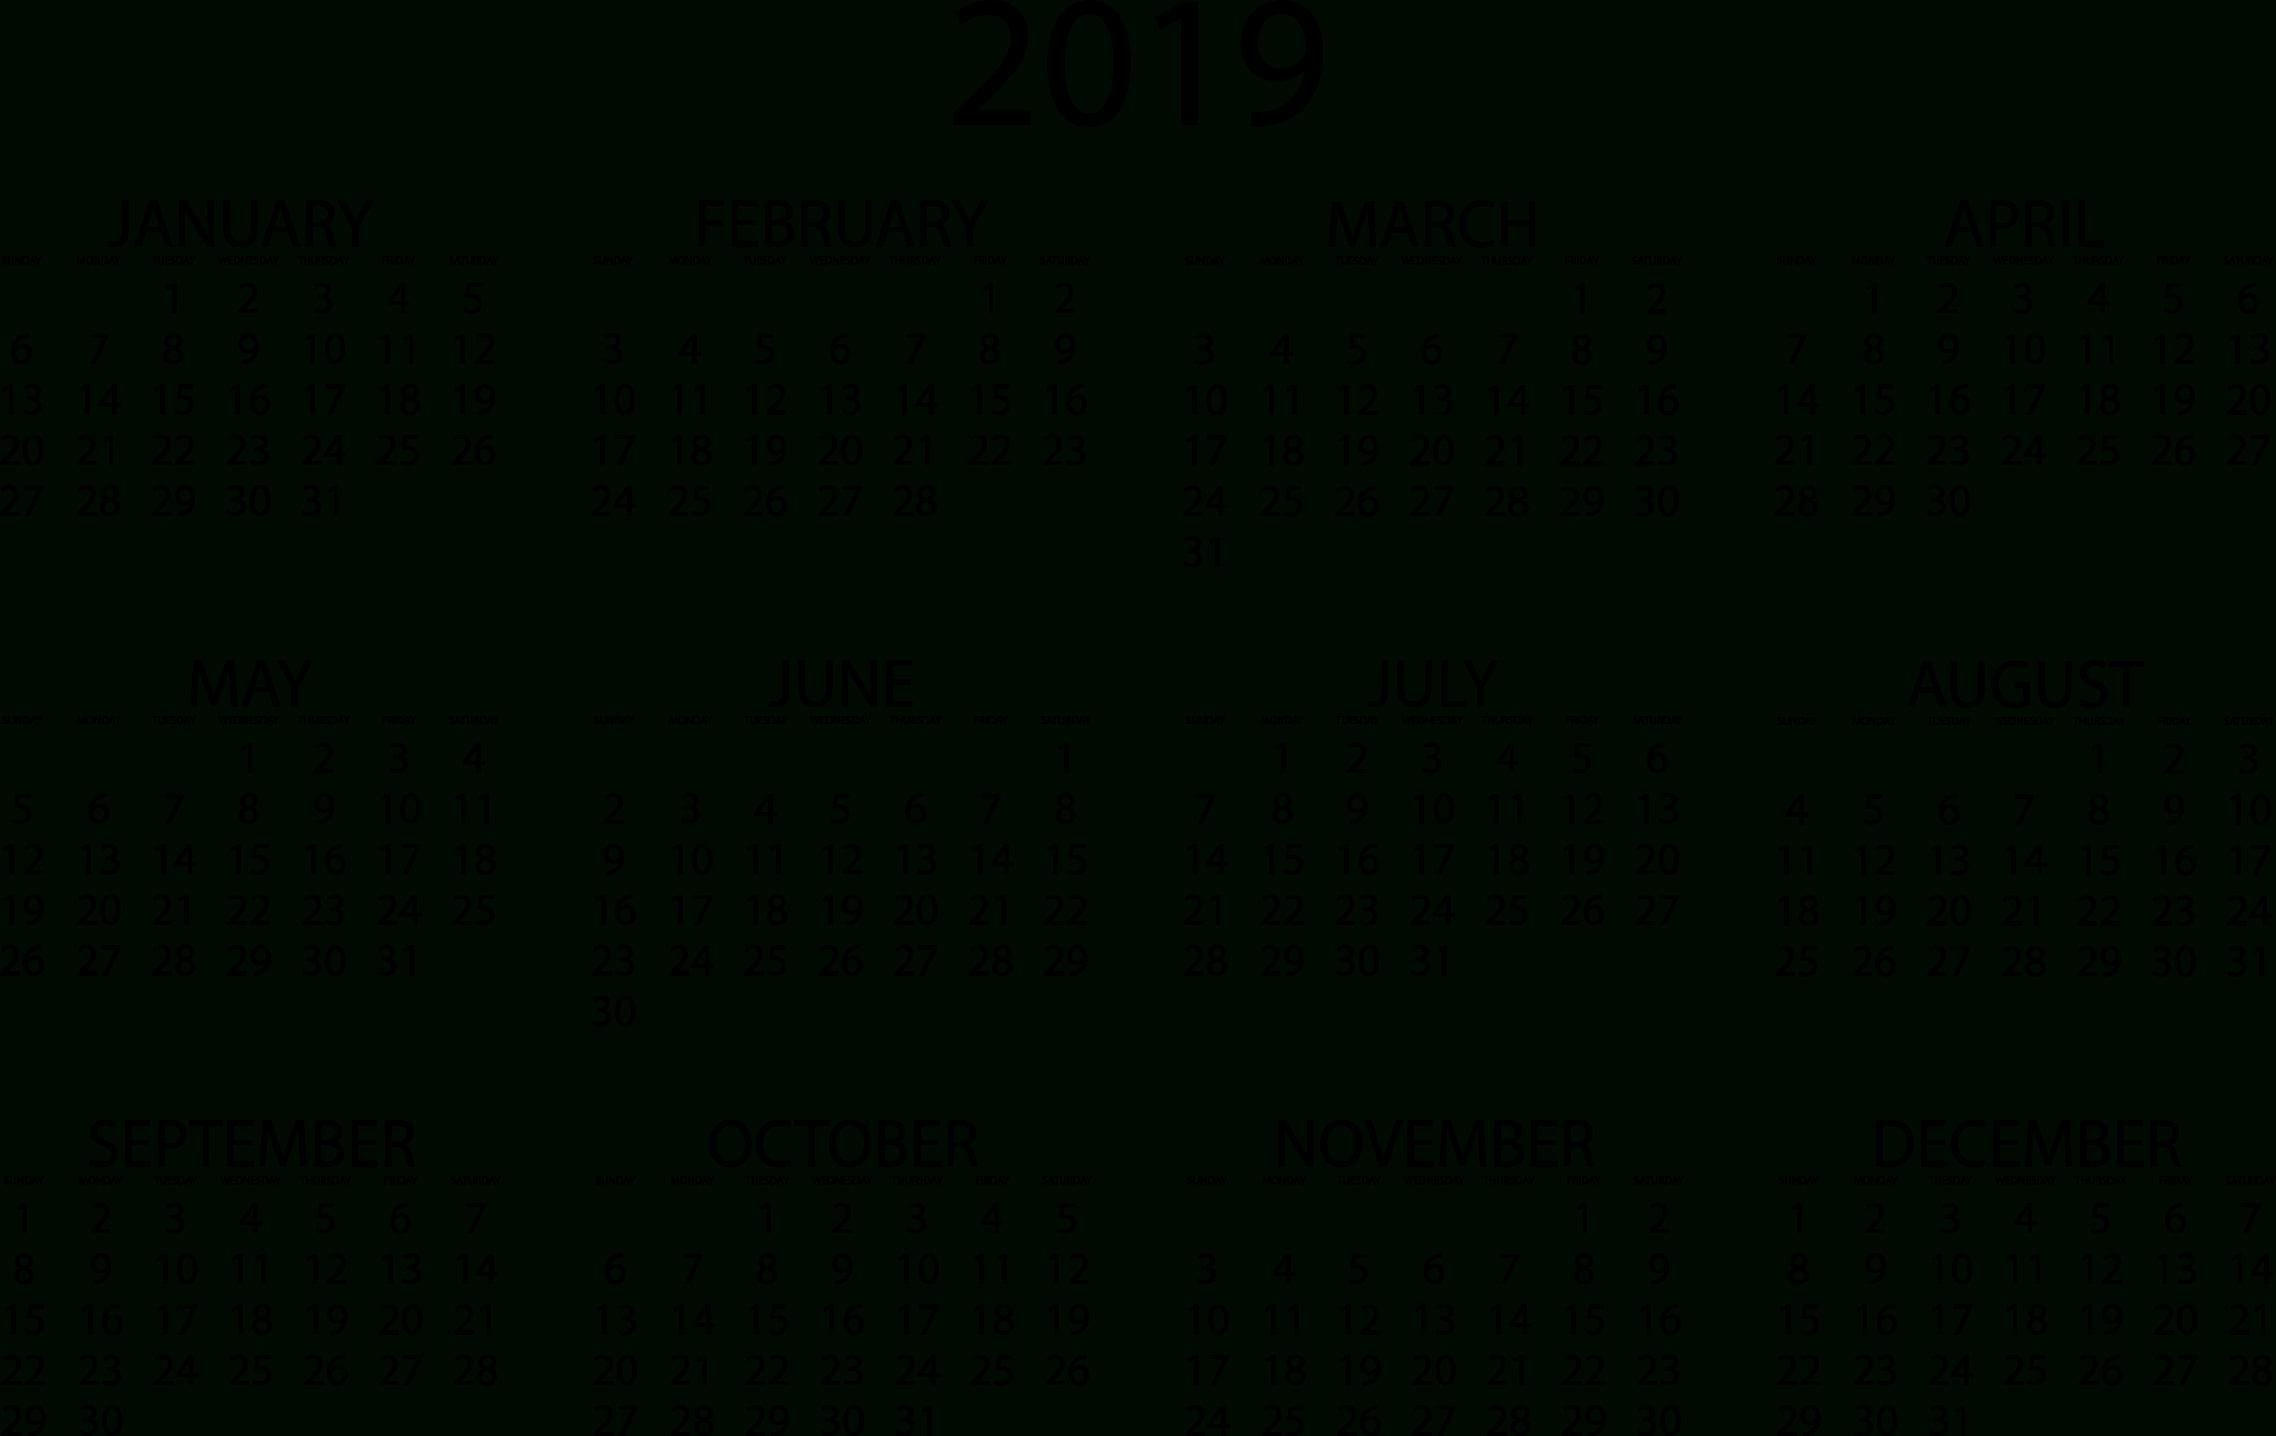 2019 Calendars – Download Printable Pdf Calendar Templates Calendar 2019 Printable